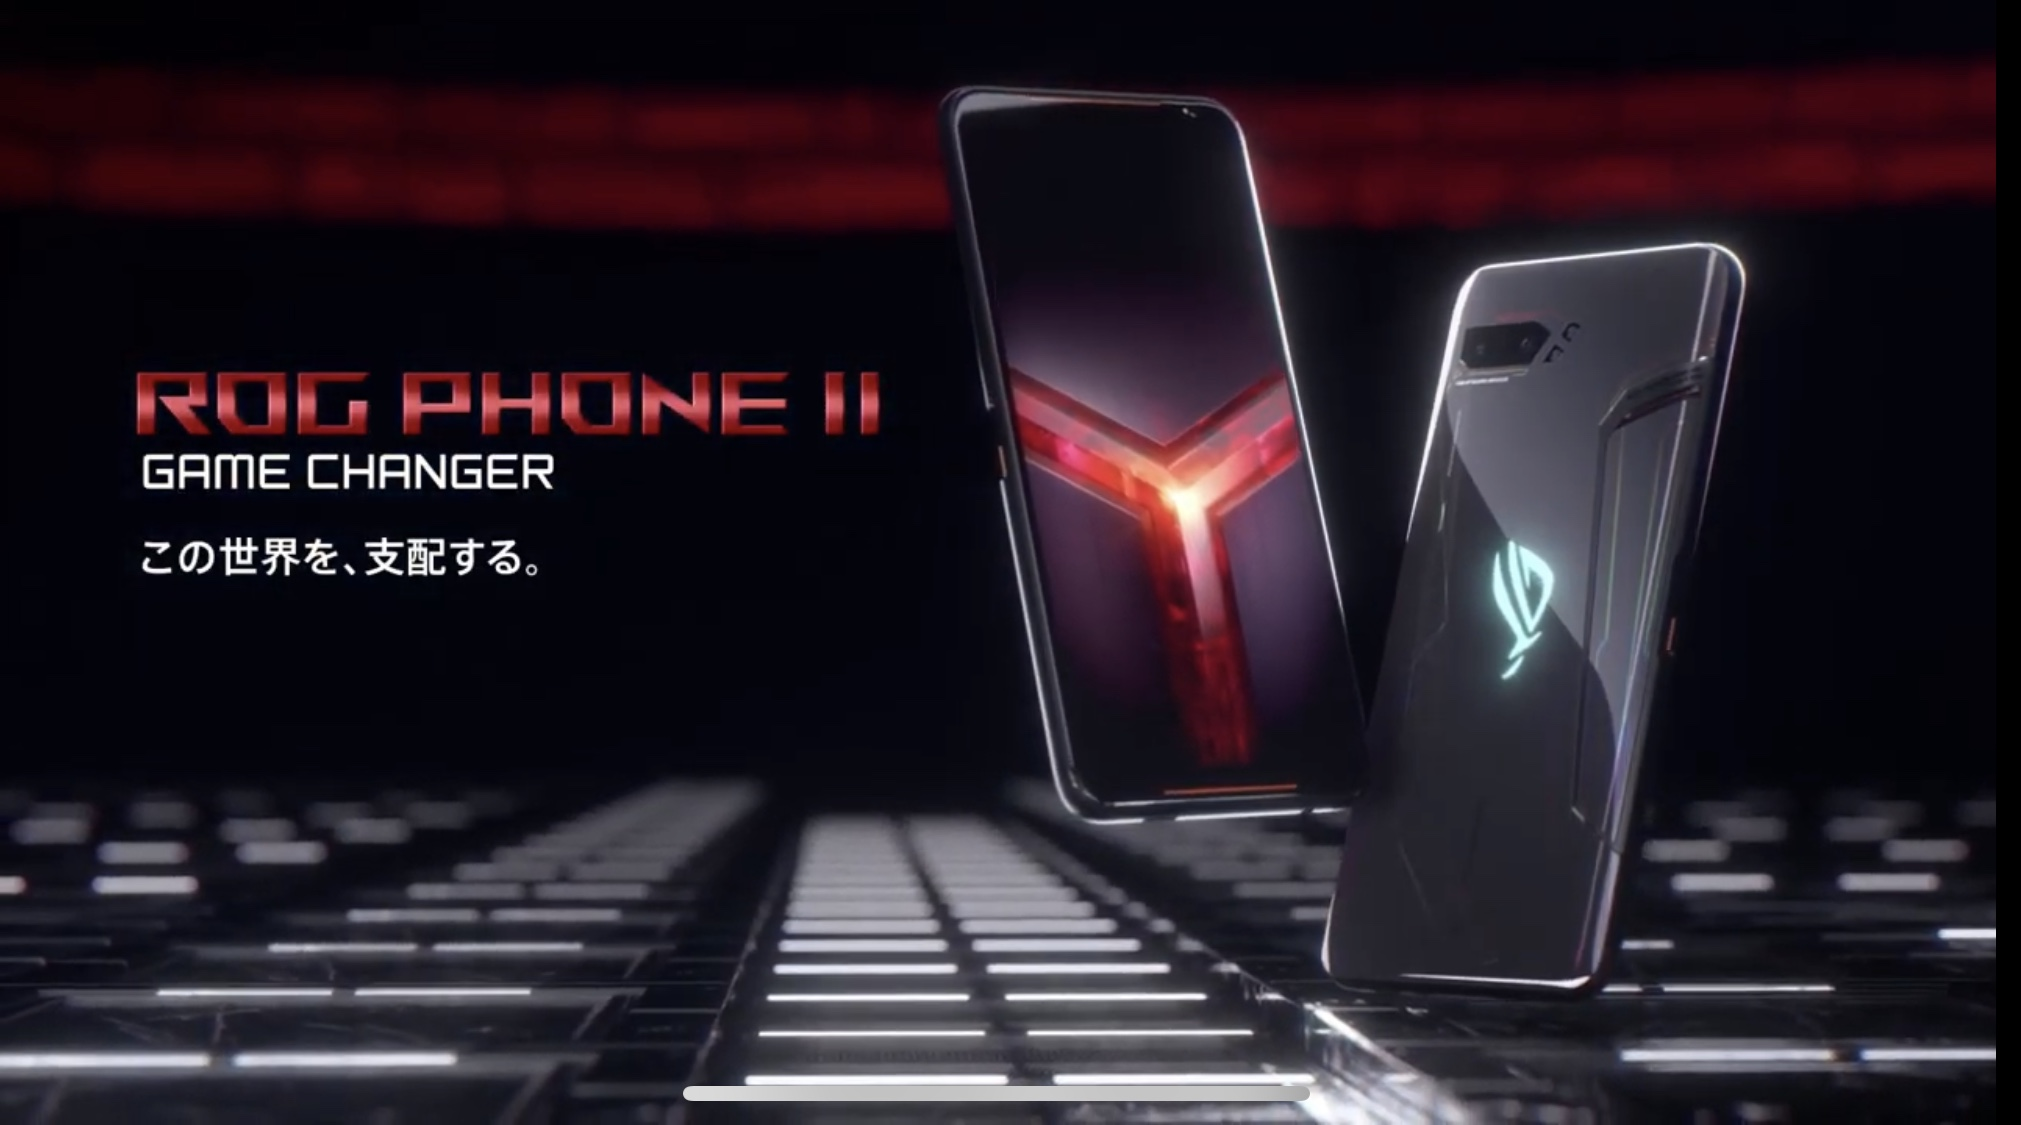 📱ROG PHONE 2 レビュー予告!ASUS/A部 史上最強ゲーミングスマホ?モニター予定!2019年11月